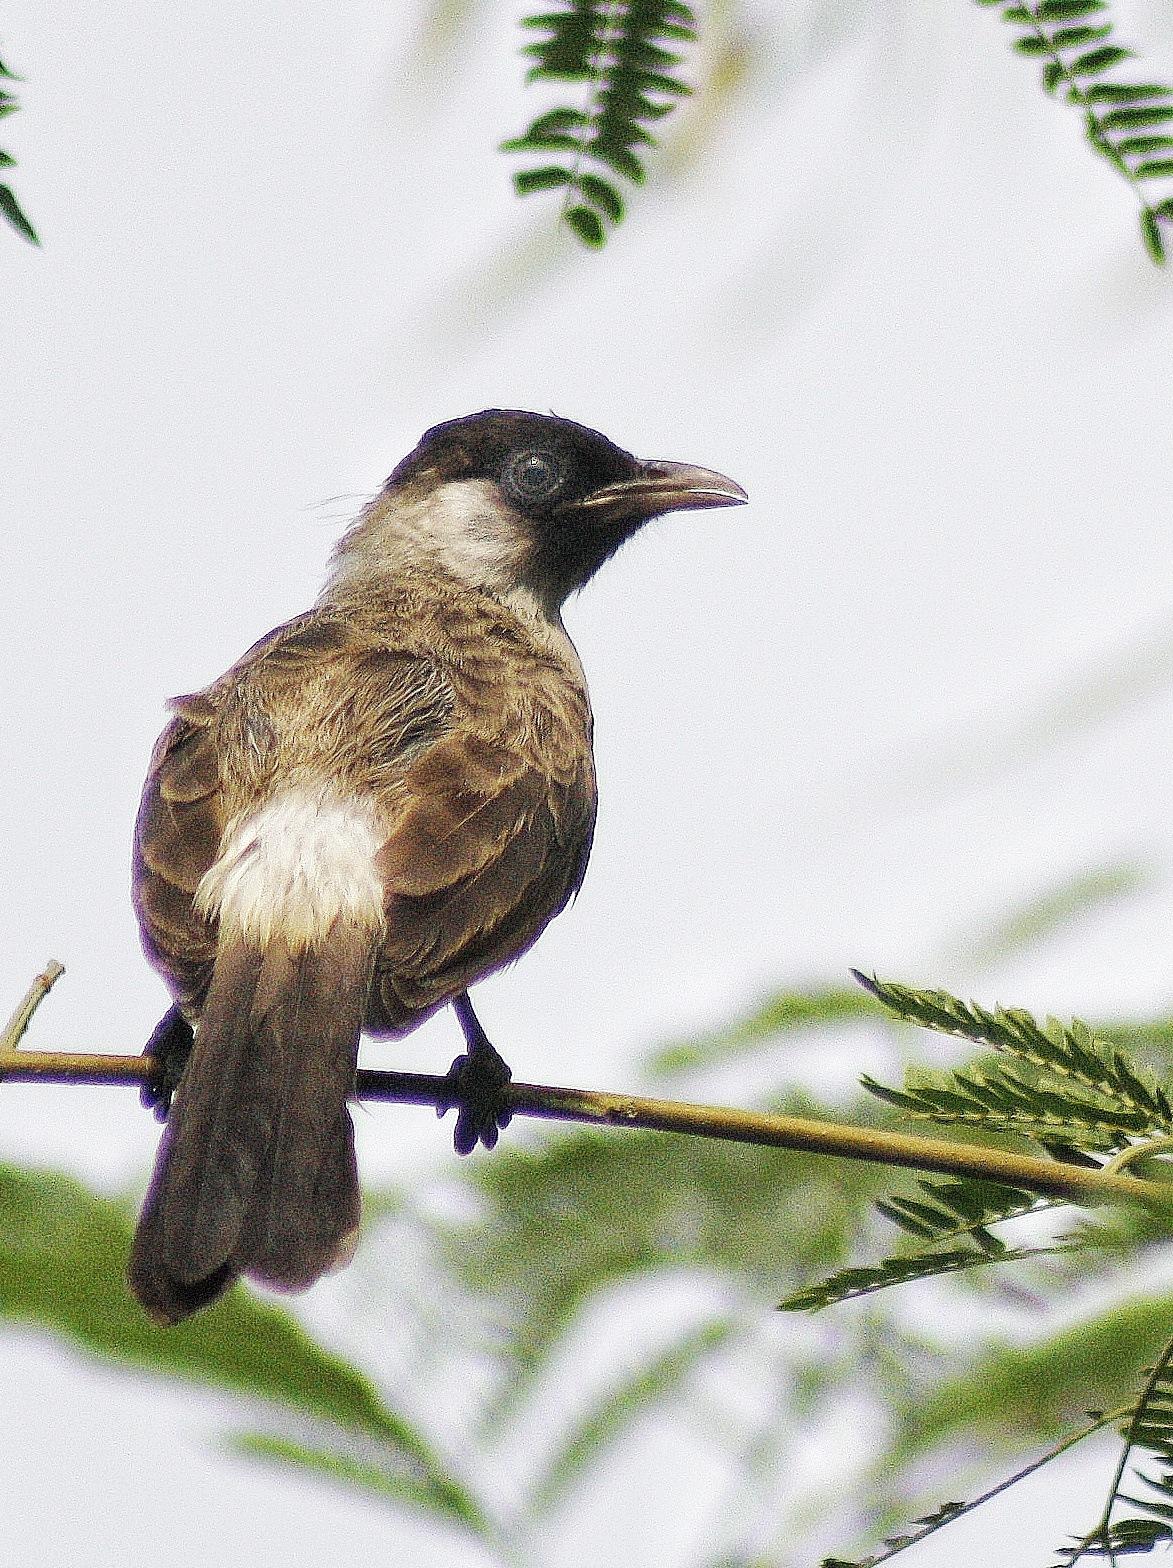 Bulbul bird by Retno